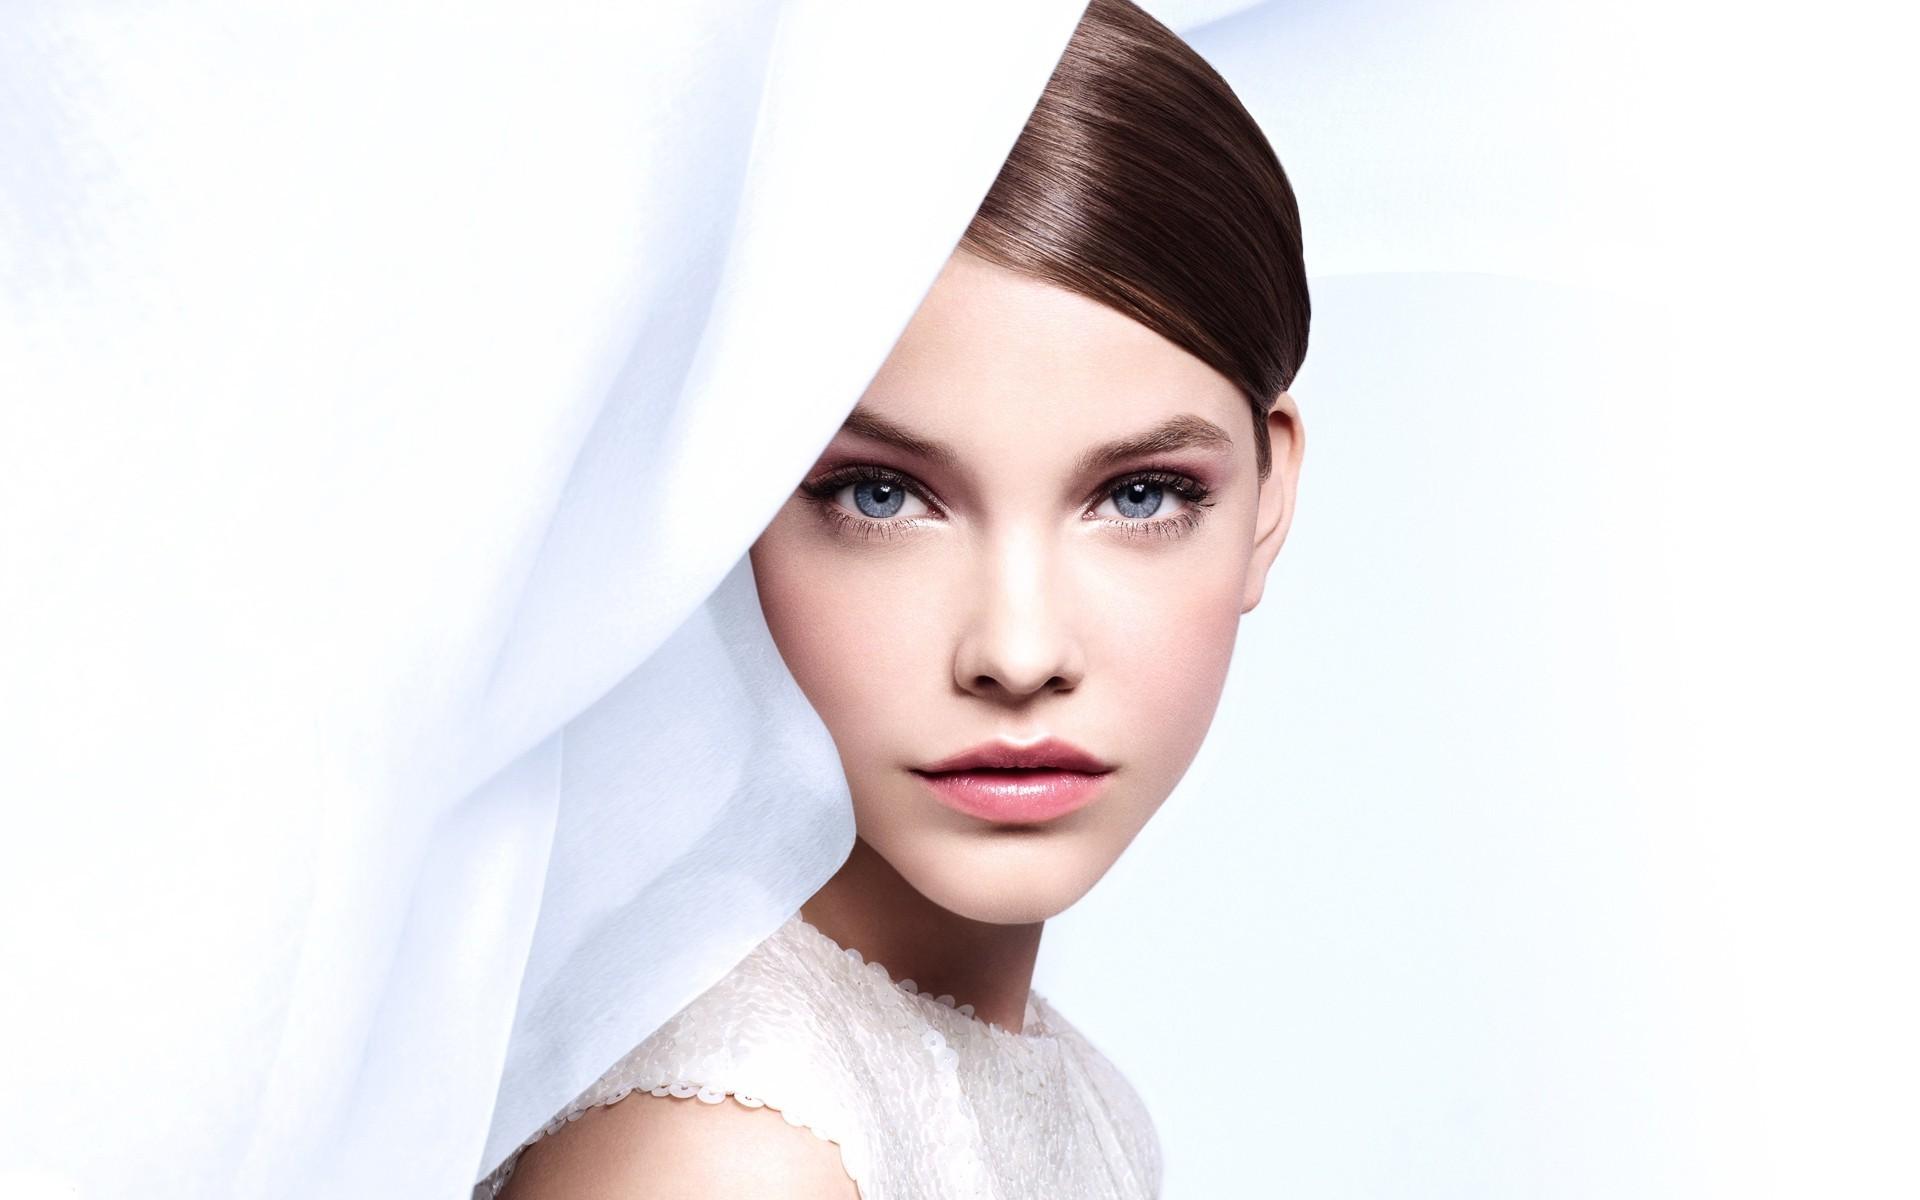 Wallpaper Face Women Model Long Hair Blue Eyes: Wallpaper : Face, Women, Model, Long Hair, Blue Eyes